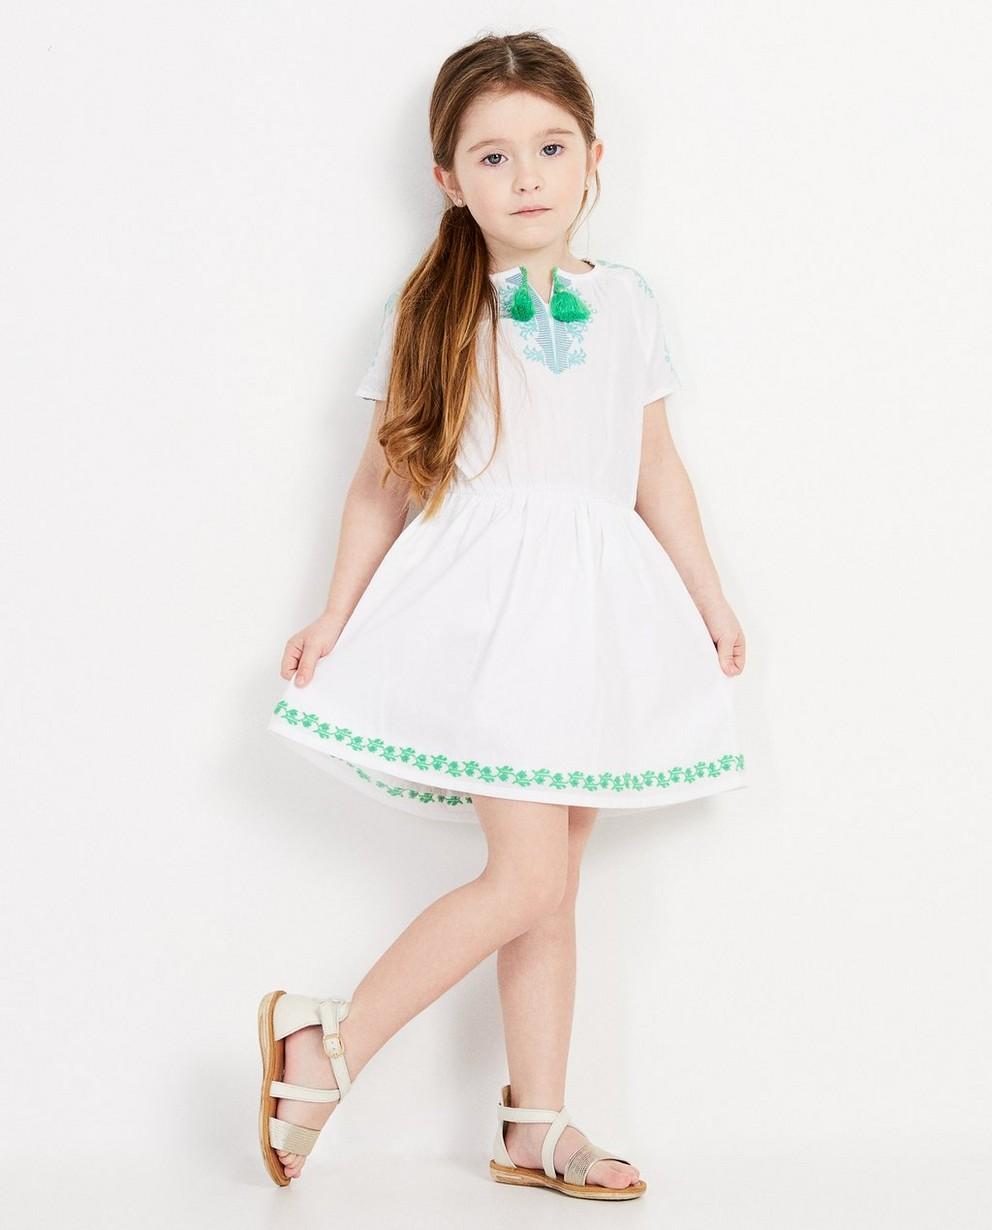 Robe blanche, détails verts - brodée - JBC